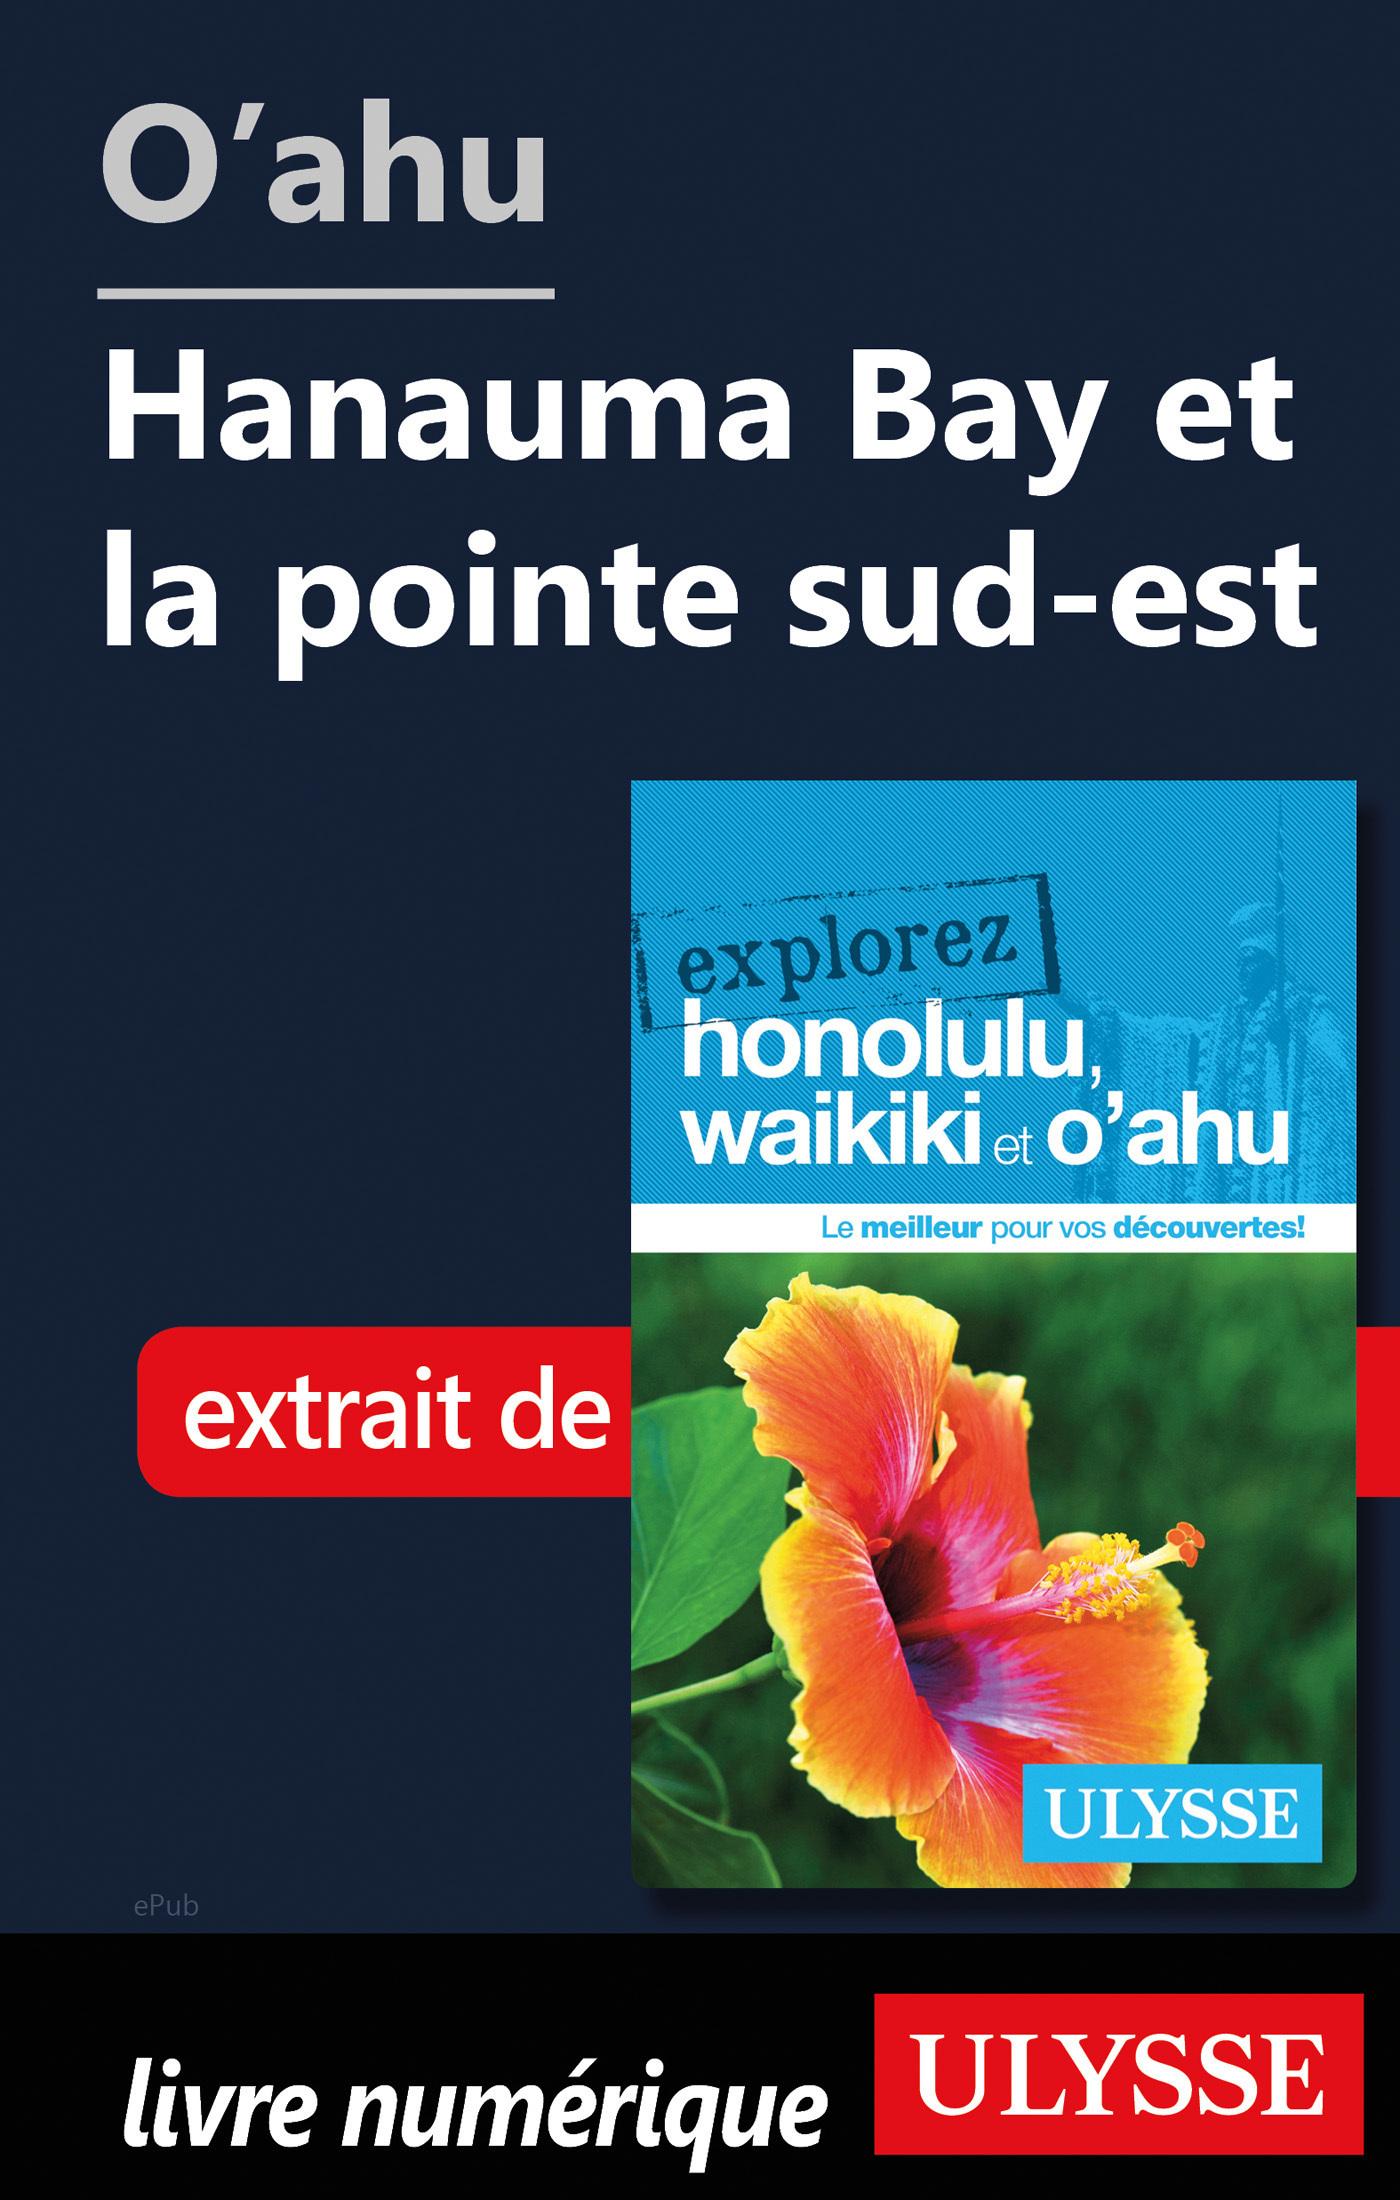 O'ahu - Hanauma Bay et la pointe sud-est